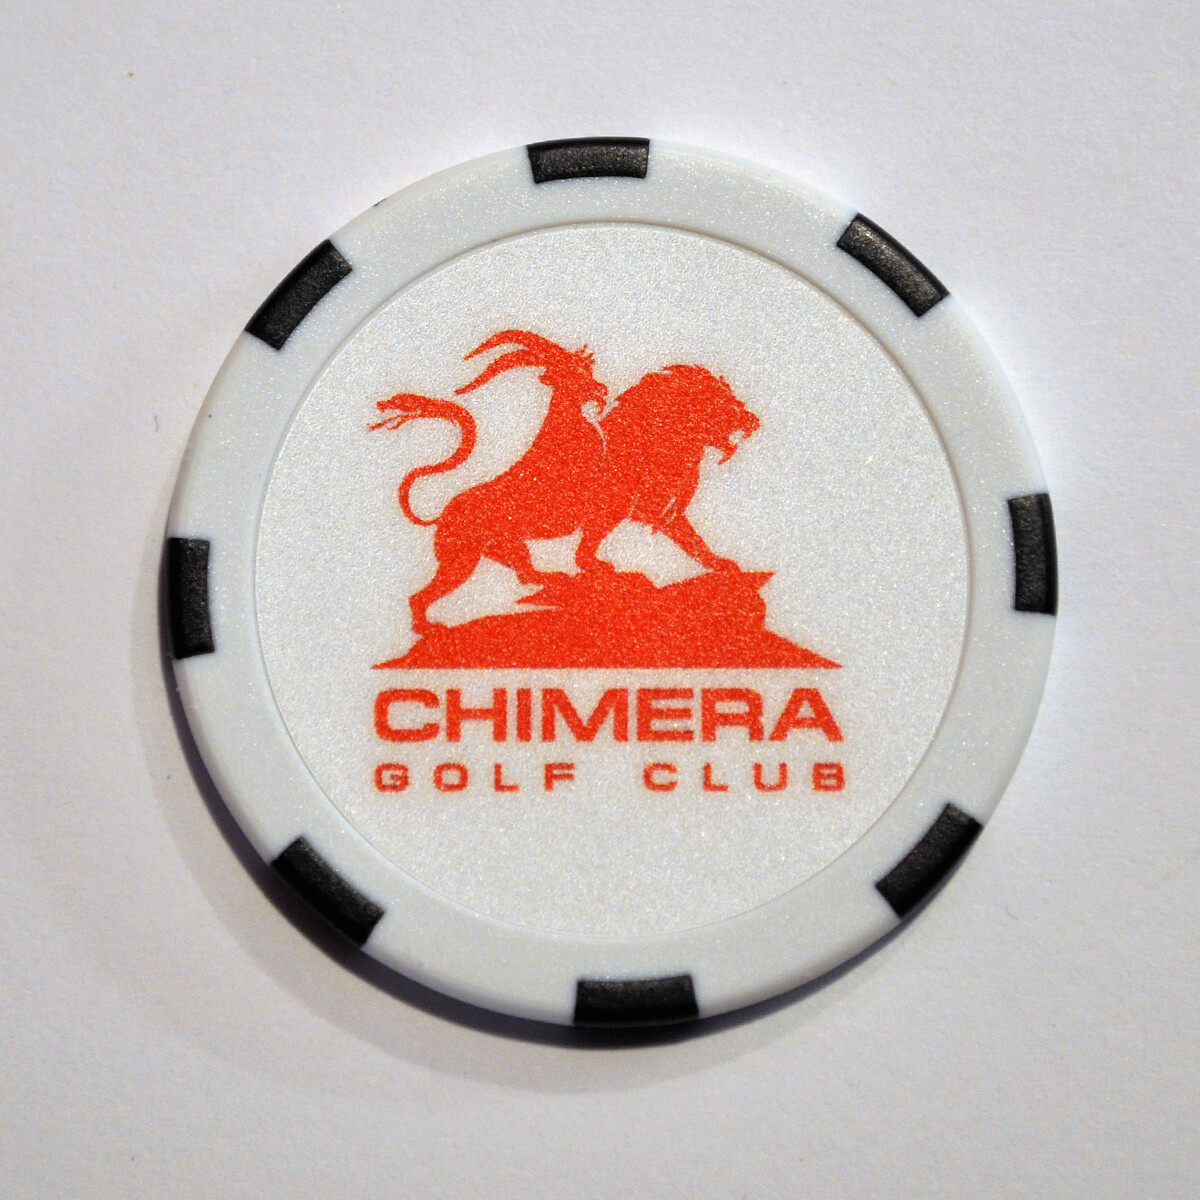 Poker Chip - Chimera - White/Black